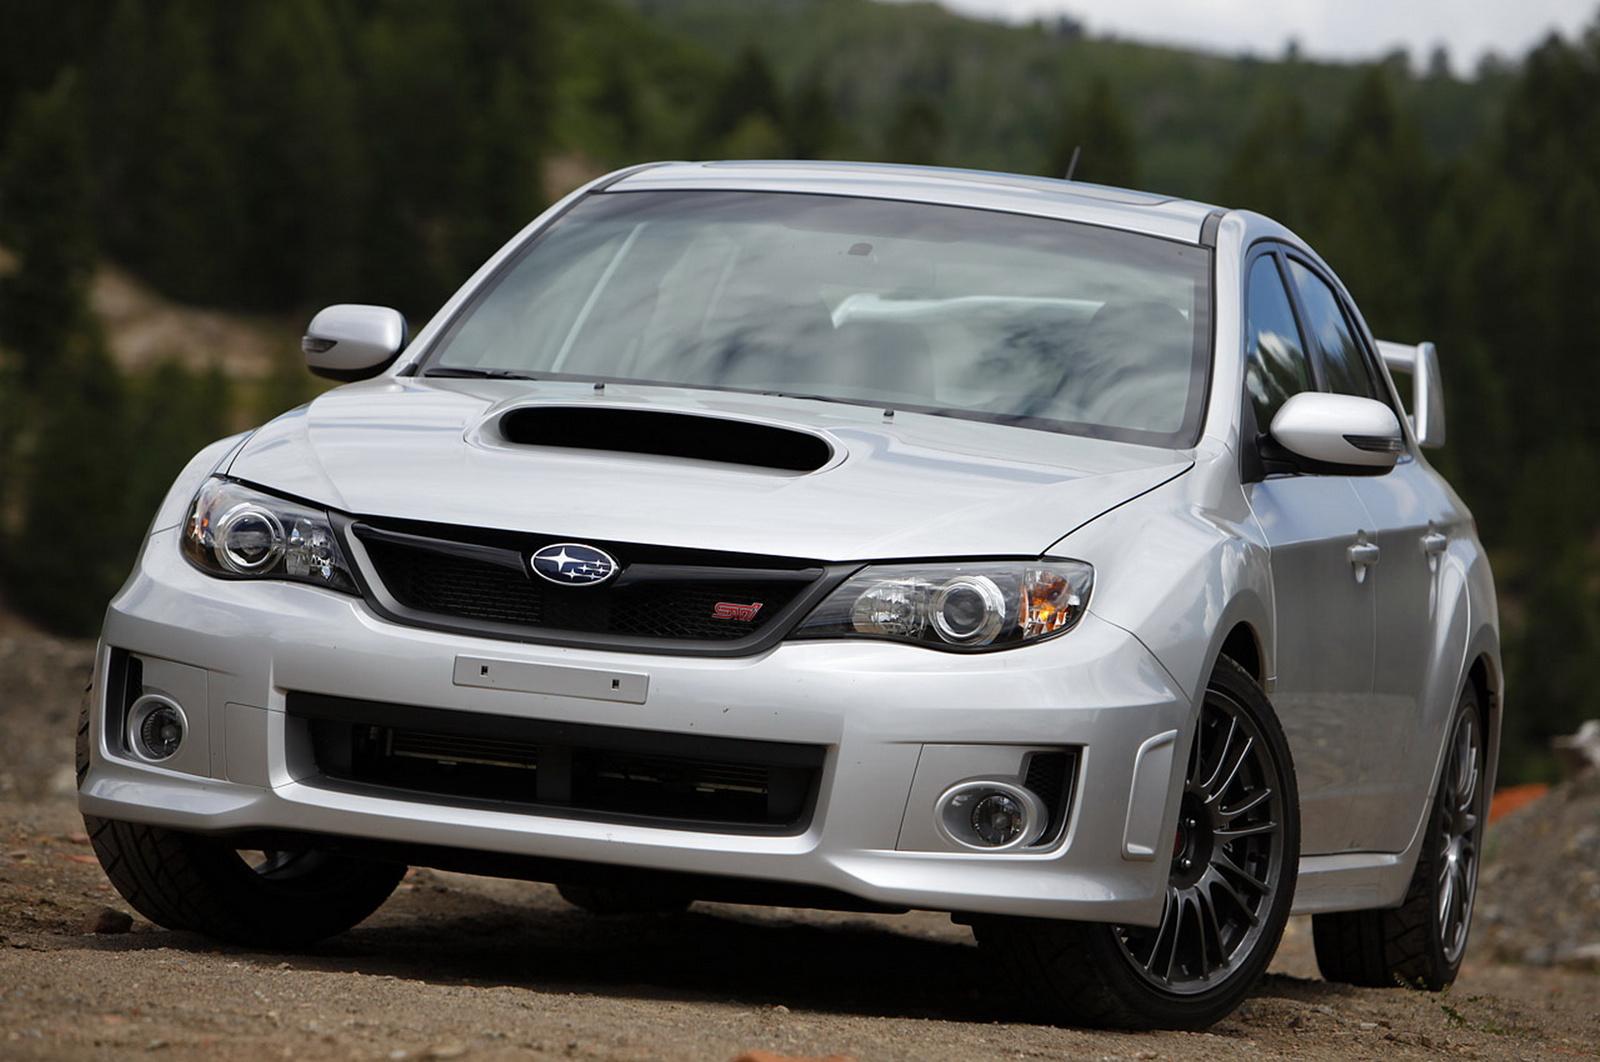 2011 Subaru Impreza WRX STi Pictures CarGurus